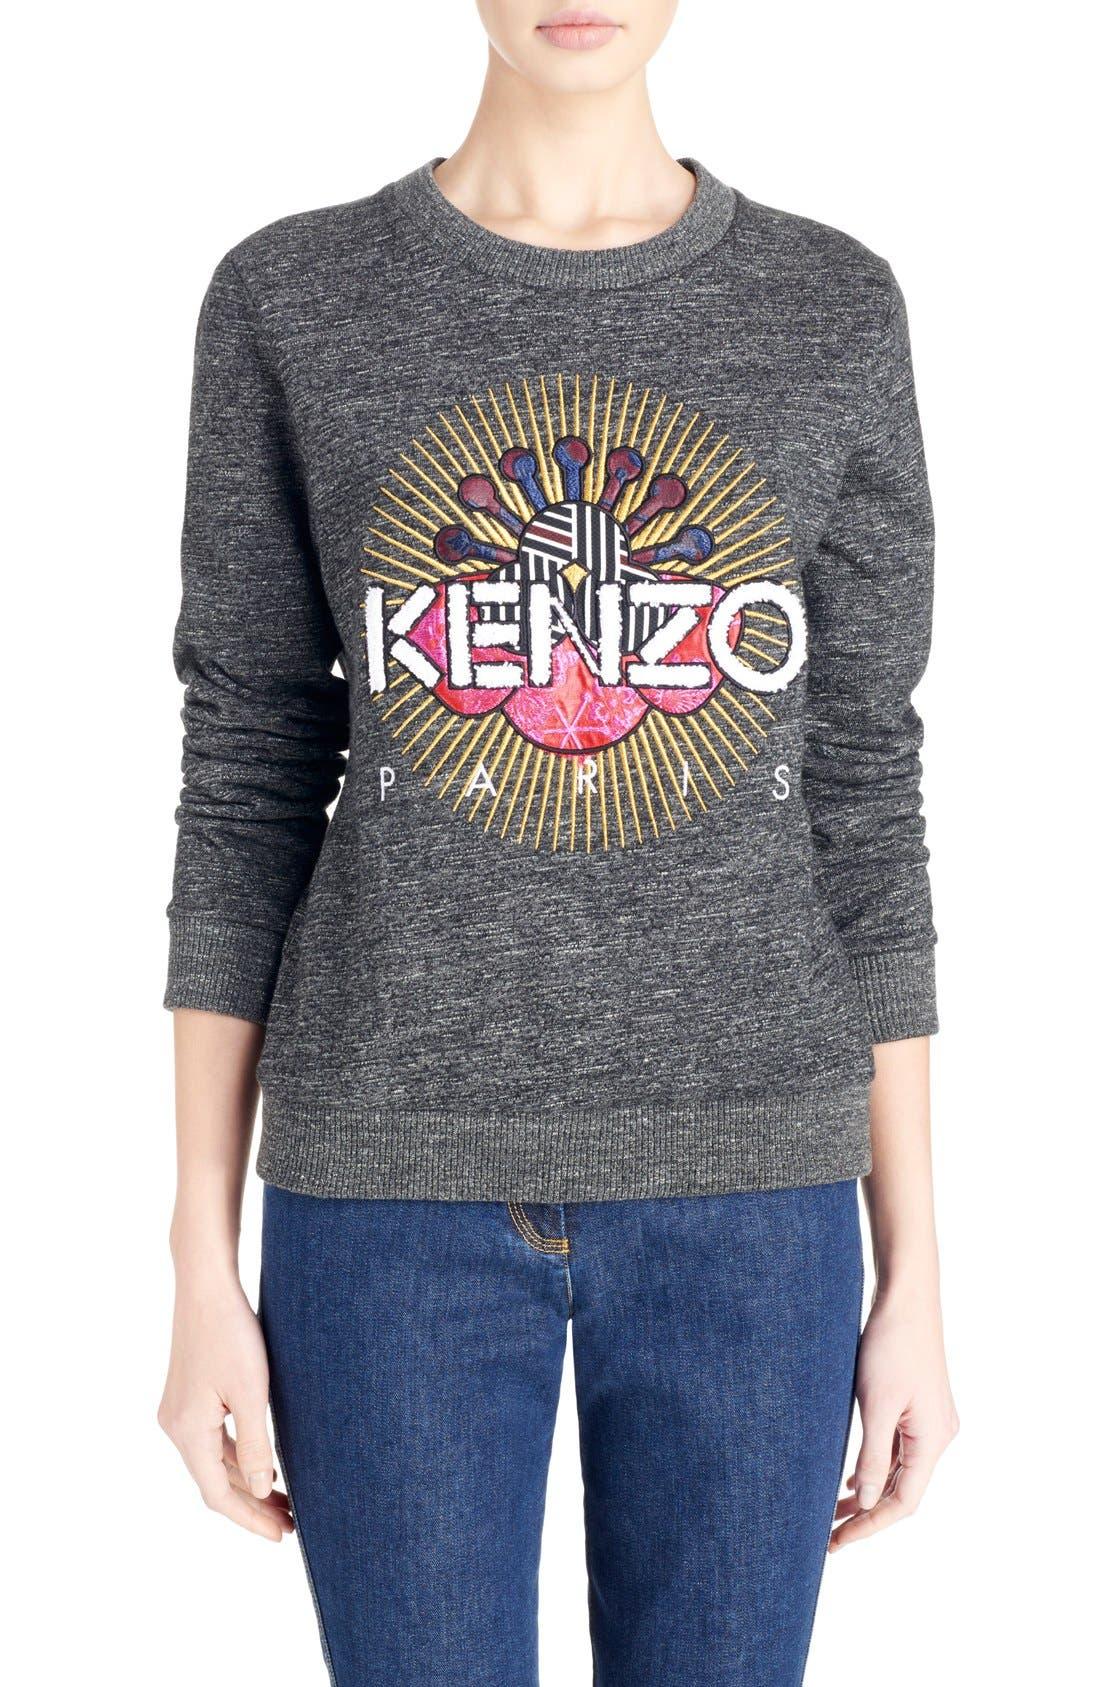 Alternate Image 1 Selected - KENZO Graphic Molleton Sweatshirt